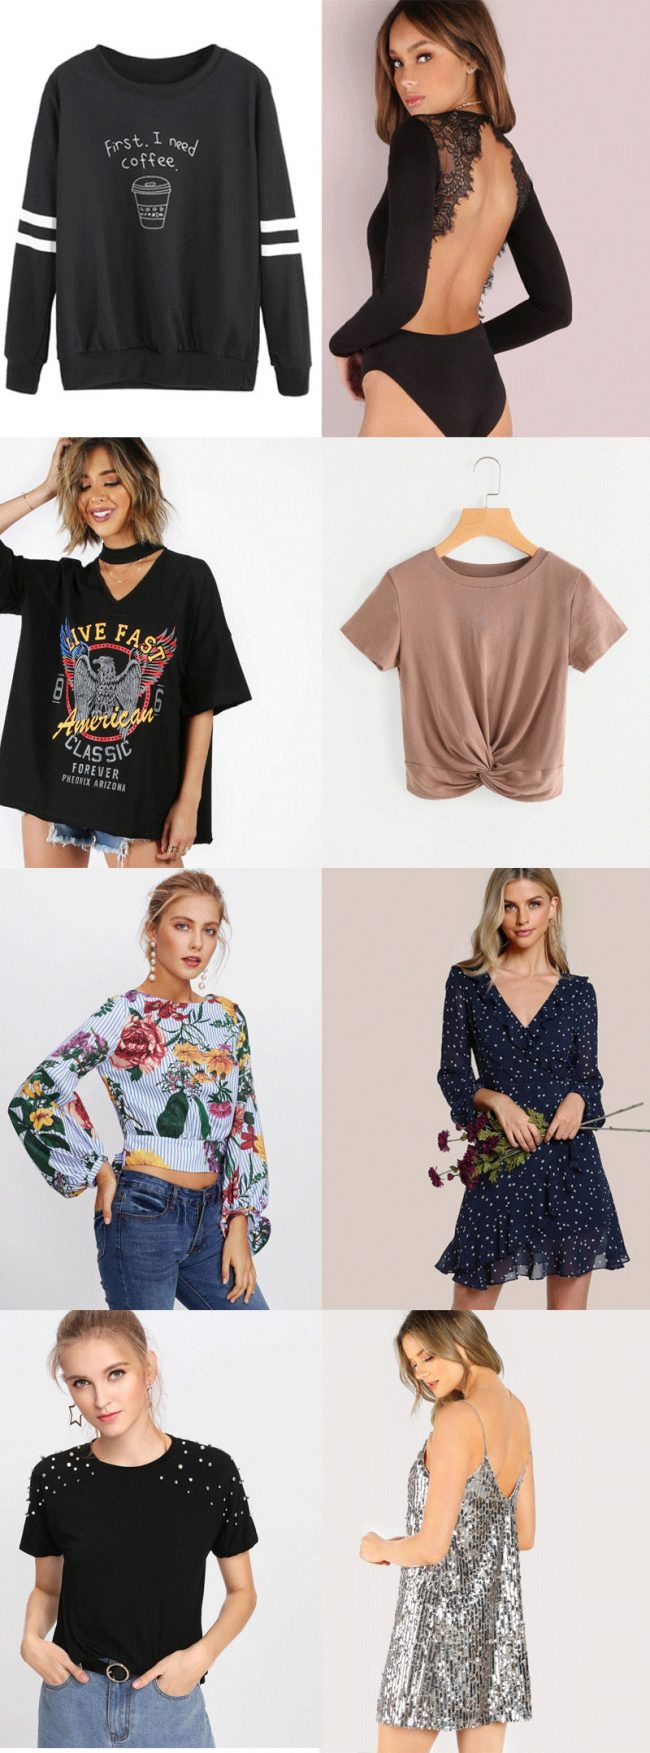 moda-roupas